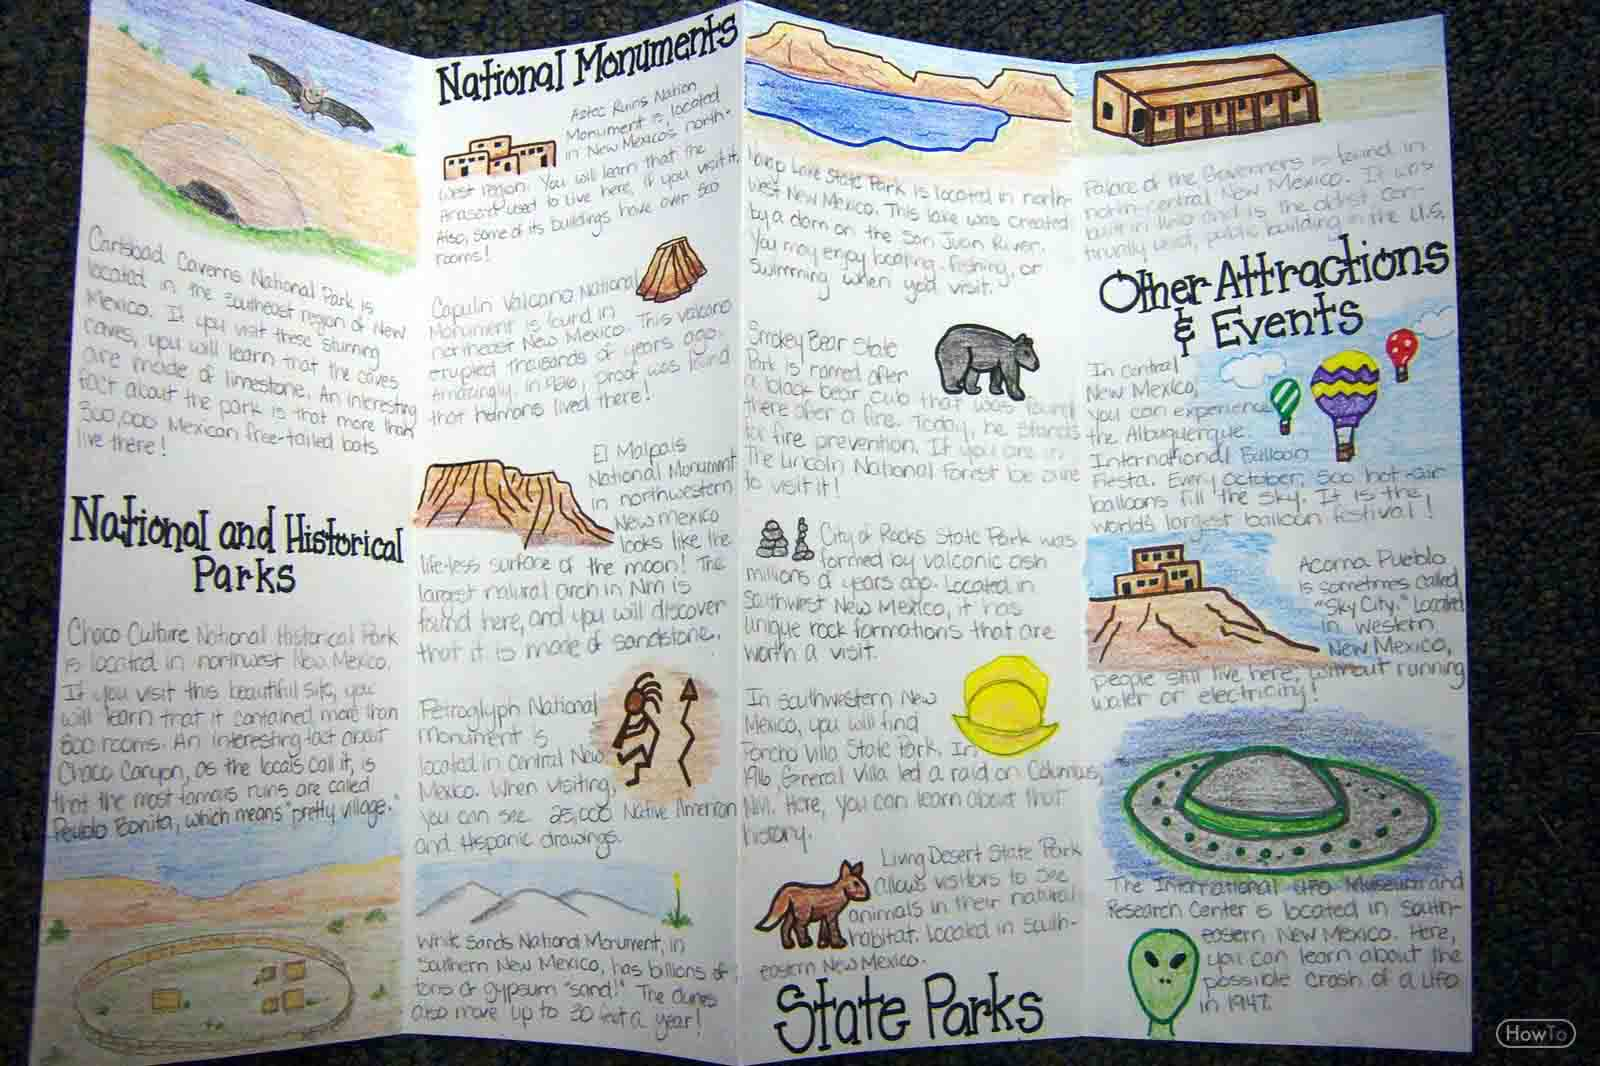 20 New For Handmade Travel Brochure School Project Deney Budak